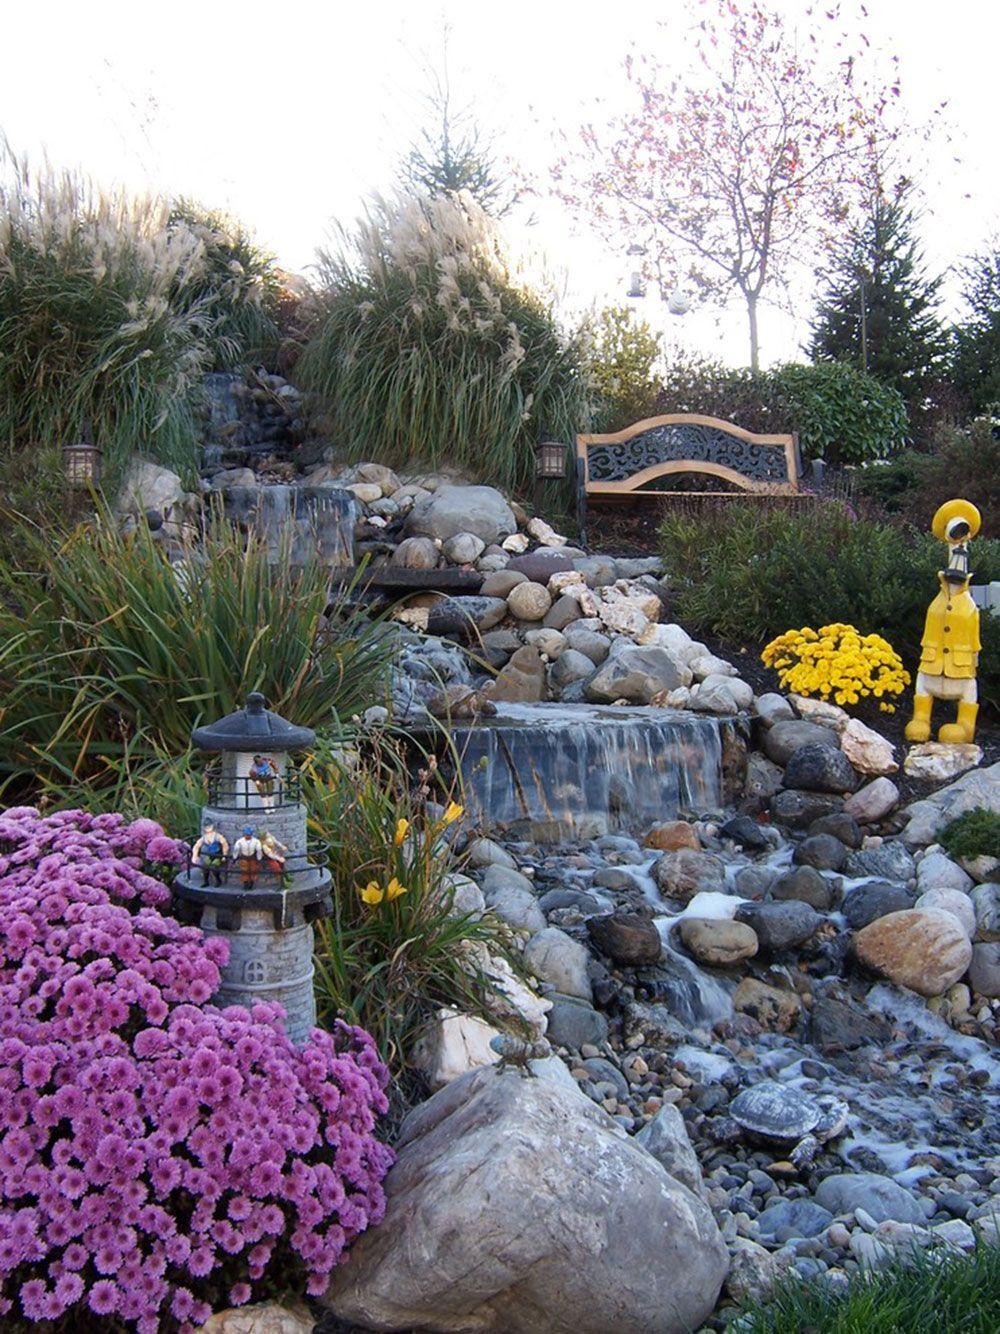 Backyard Waterfalls Ideas To Inspire You | Garden ... on Garden Waterfall Design id=84363